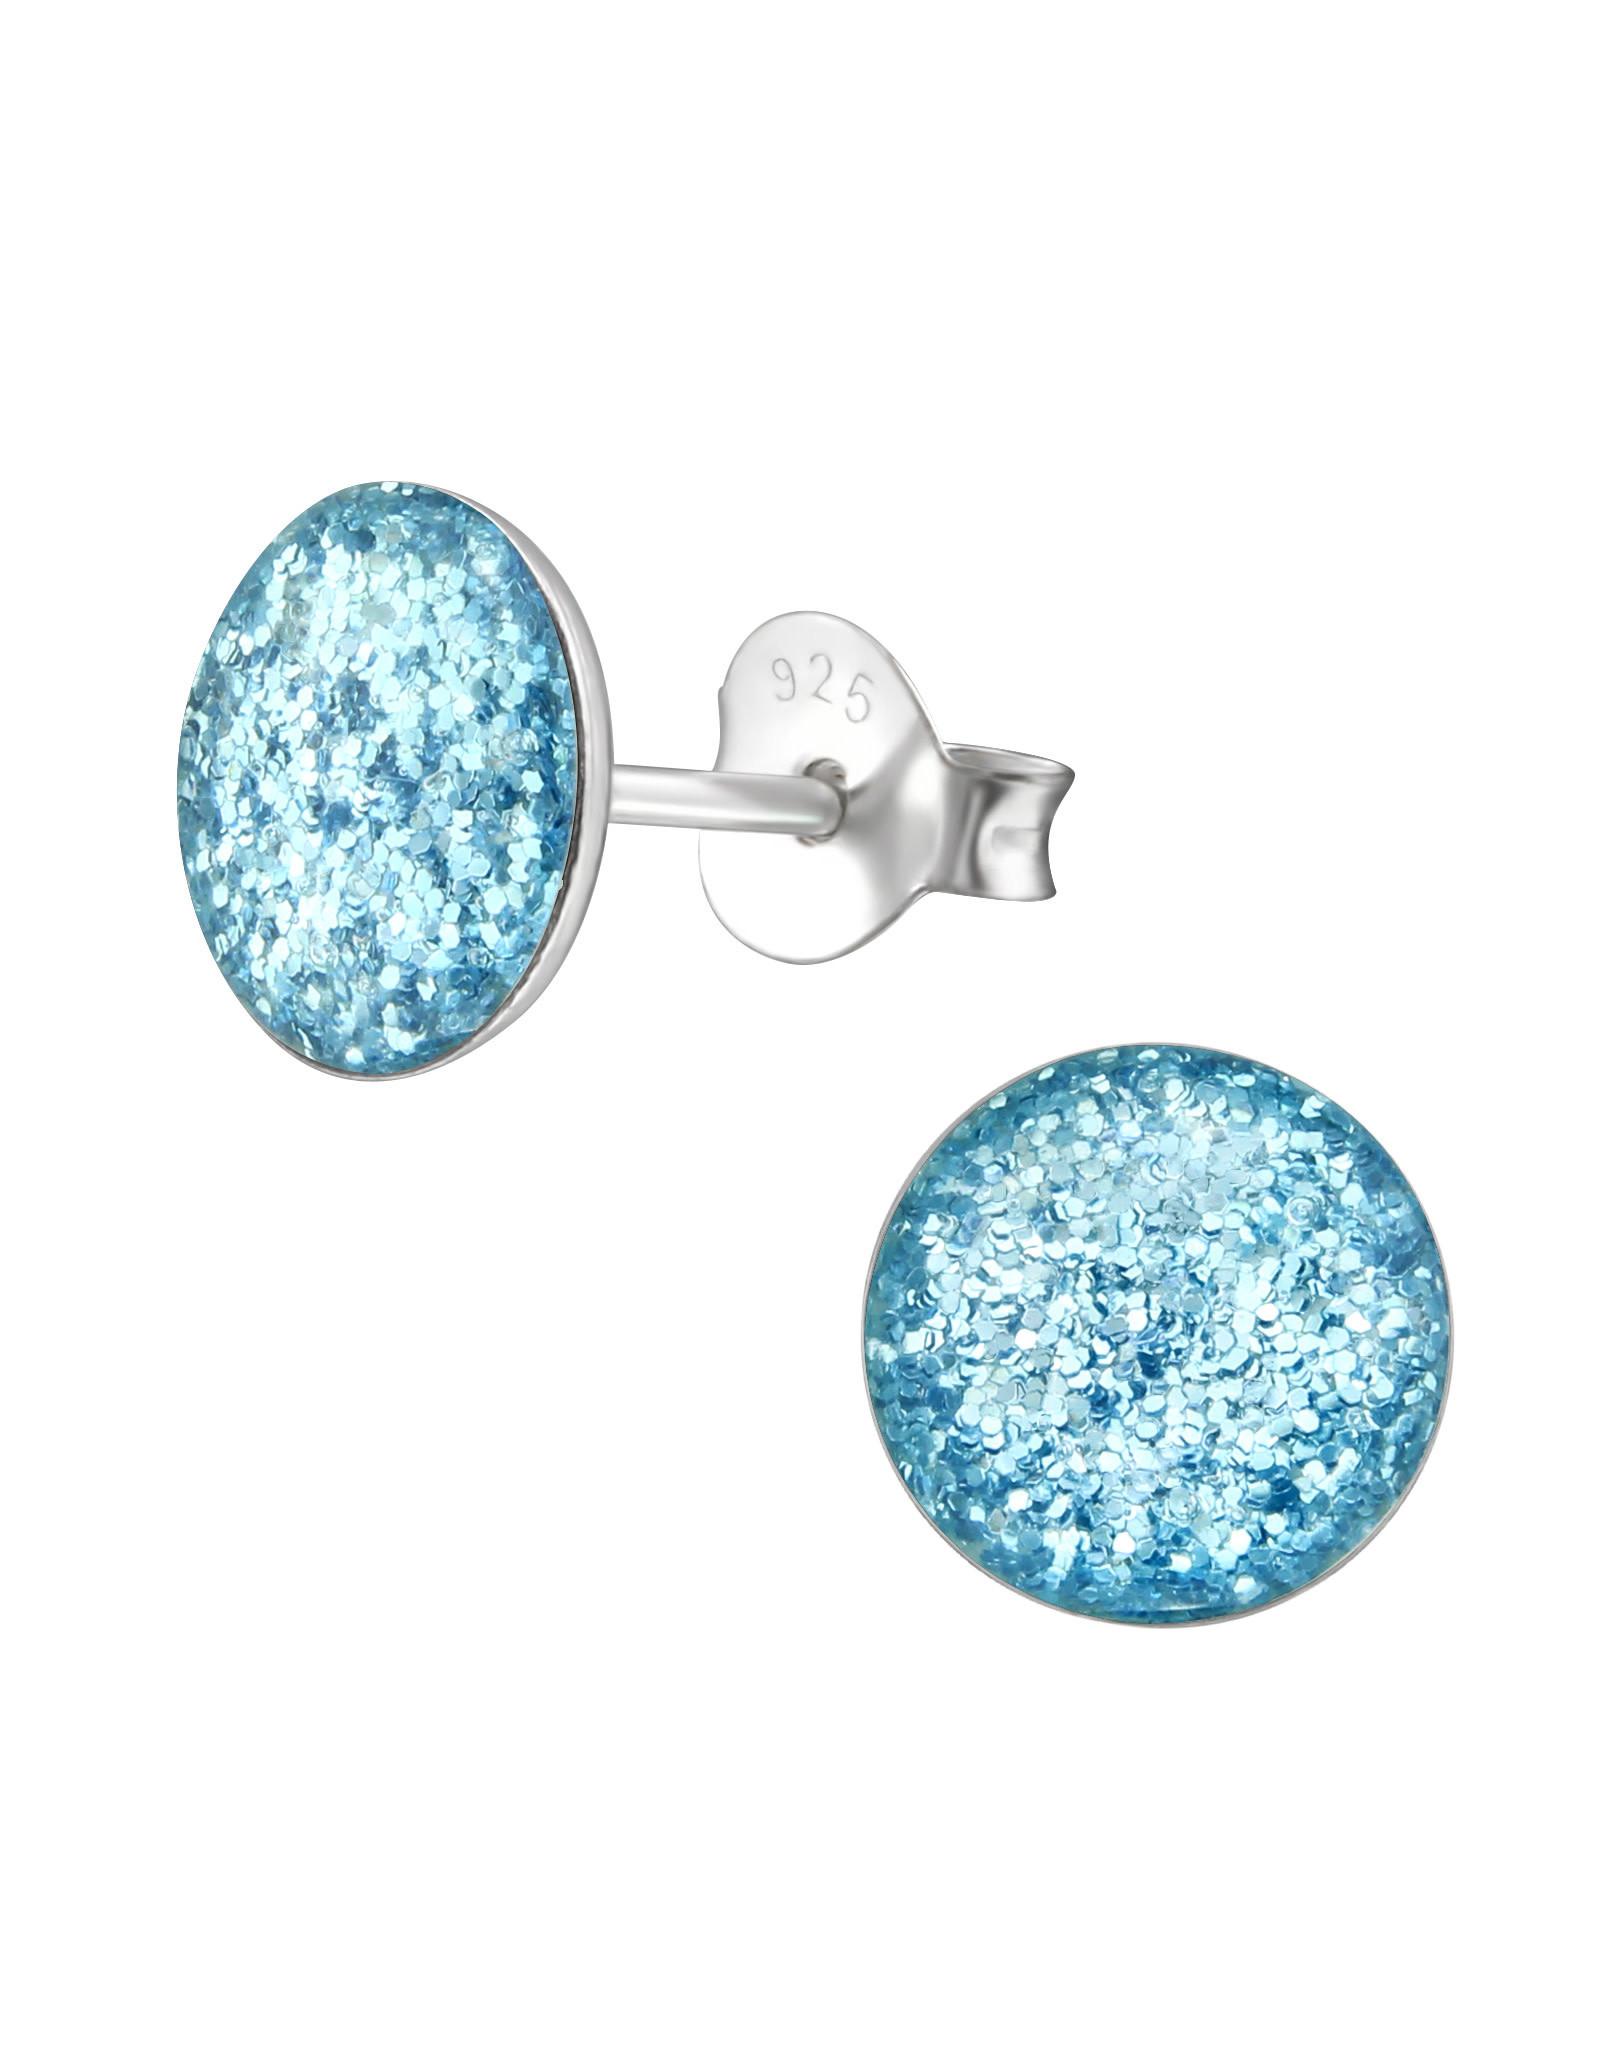 Stekertjes zilver rond 10mm zilver blauw